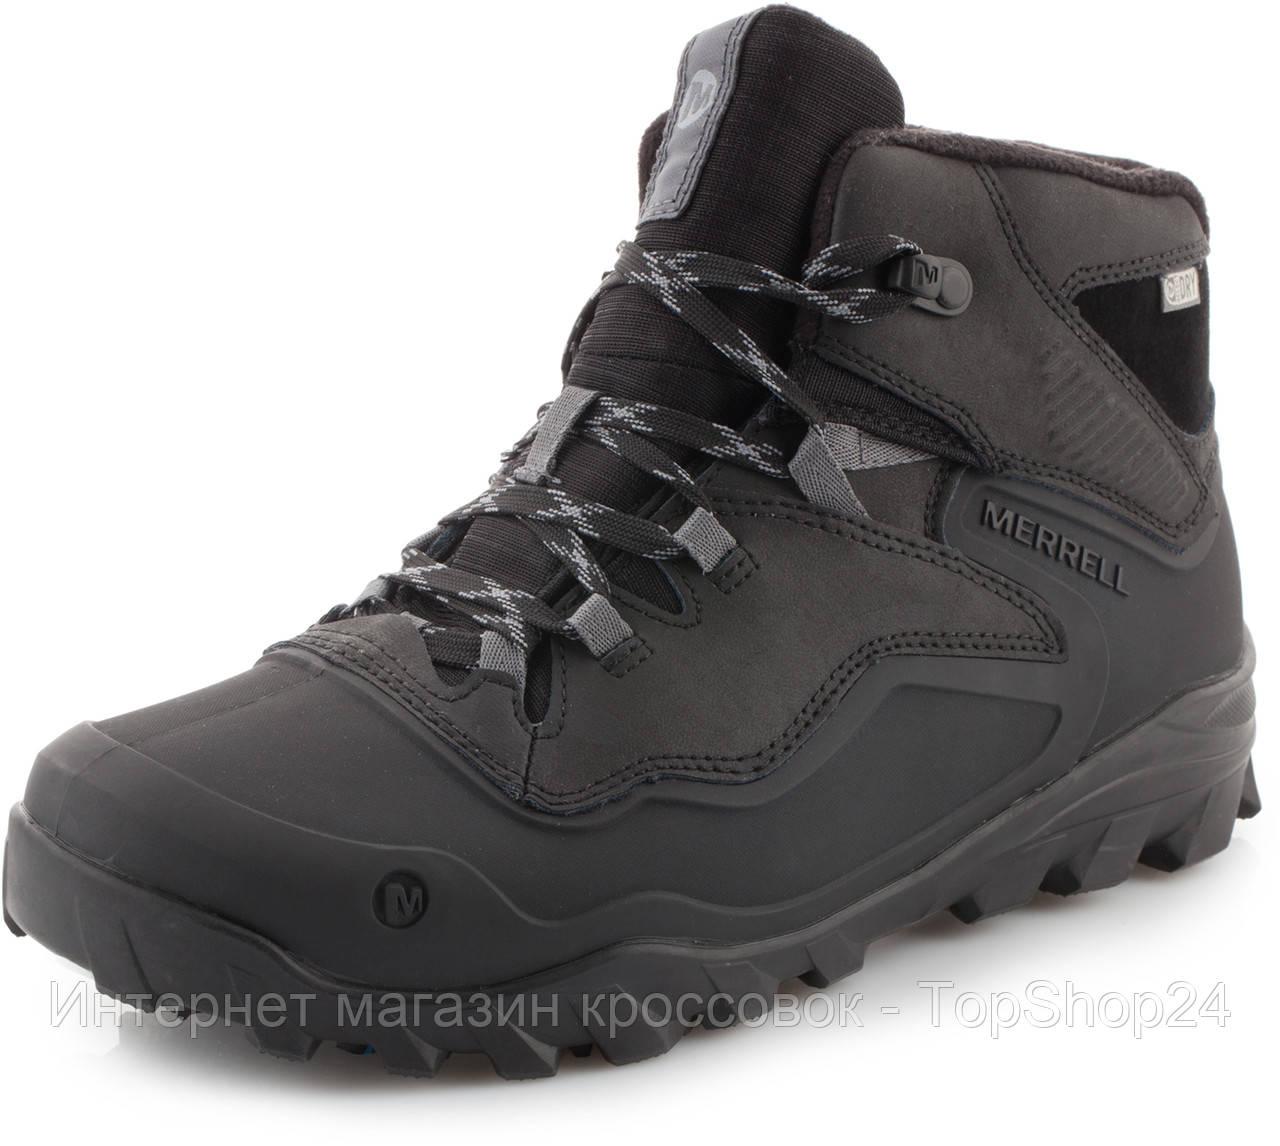 Зимние ботинки Merrell Overlook 6 Ice+ WTPF J37039